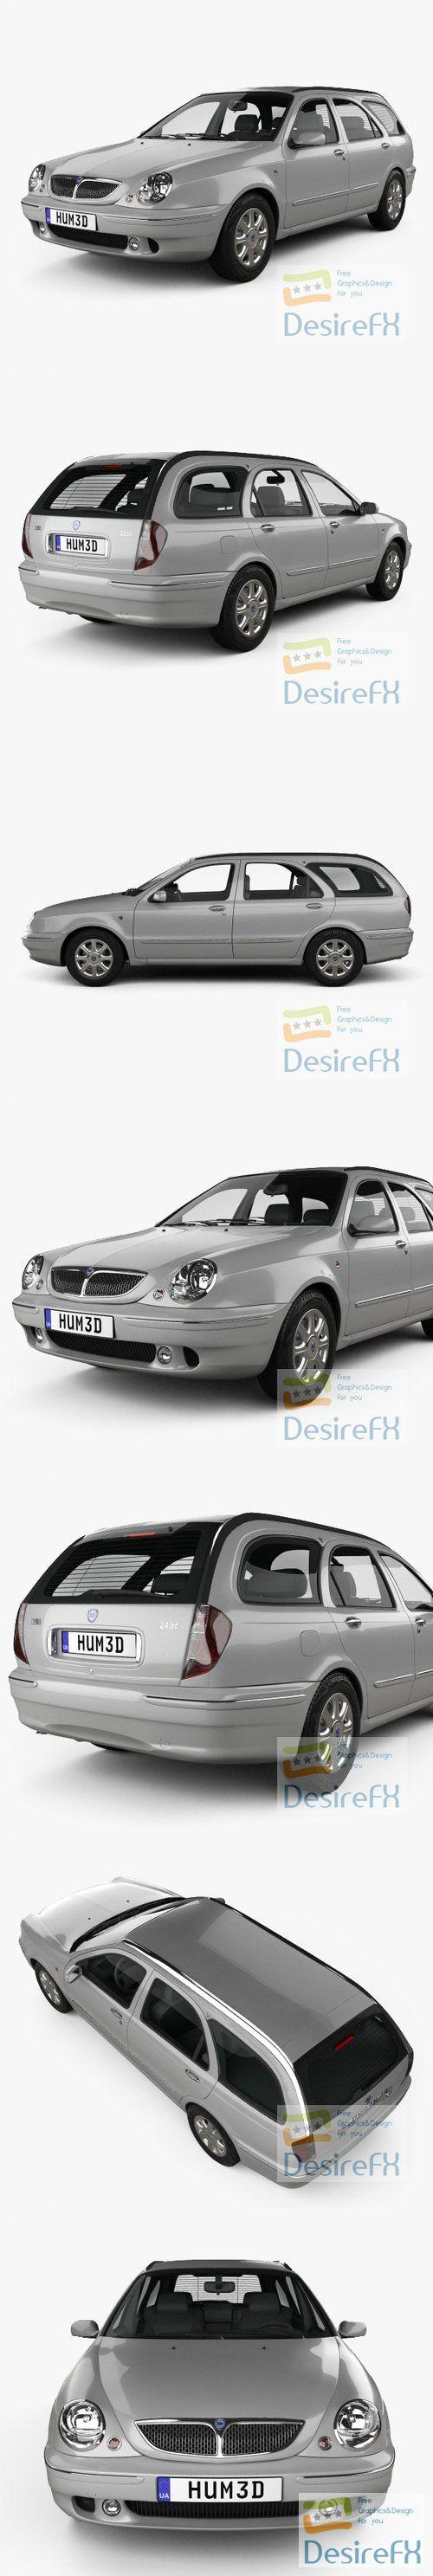 Lancia Lybra Wagon 1999 3D Model